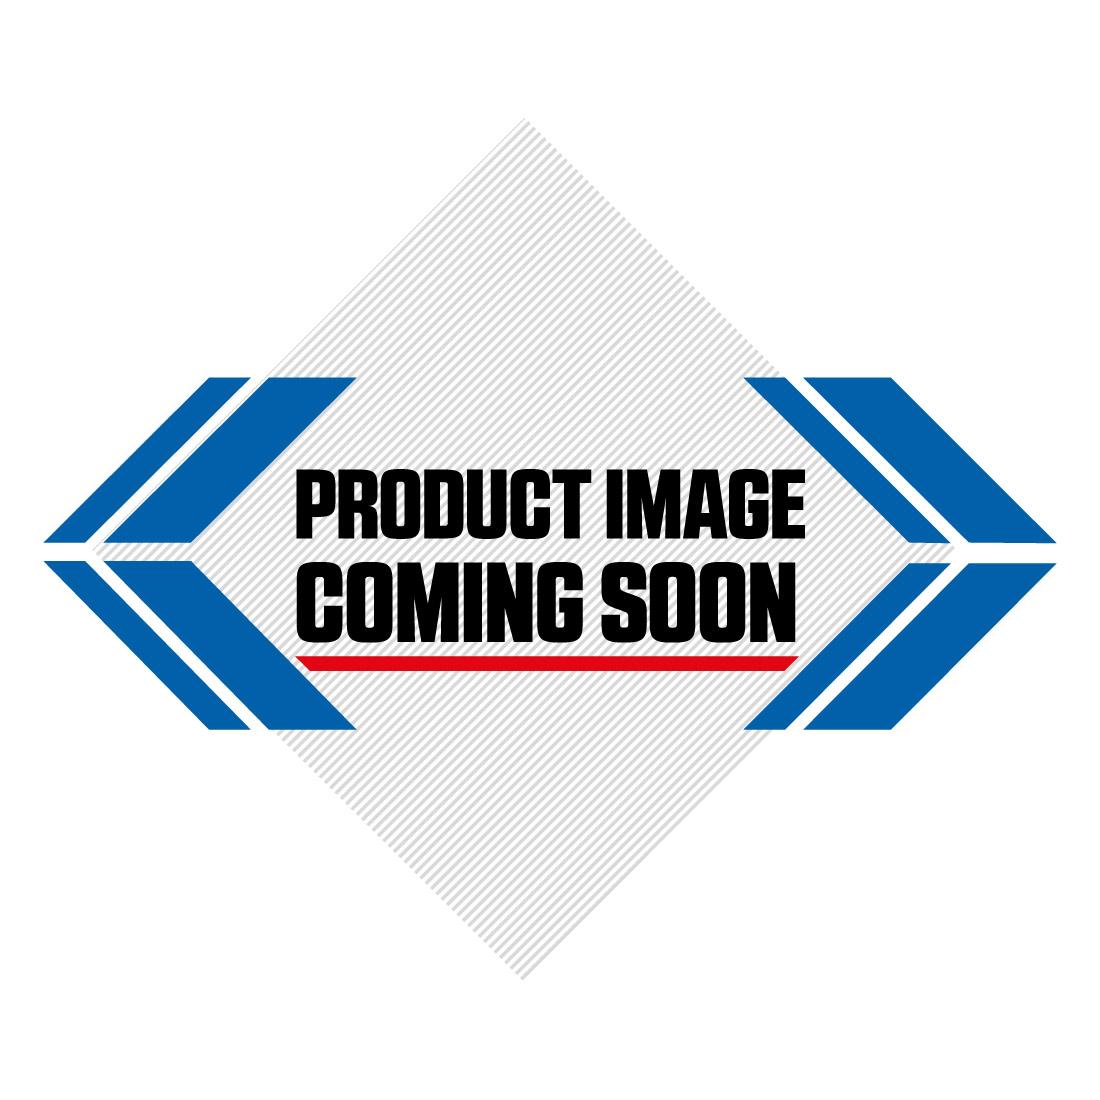 Sidi Crossfire 3 SRS Motocross Boots - TC222 Cairoli LTD Edition Image-1>